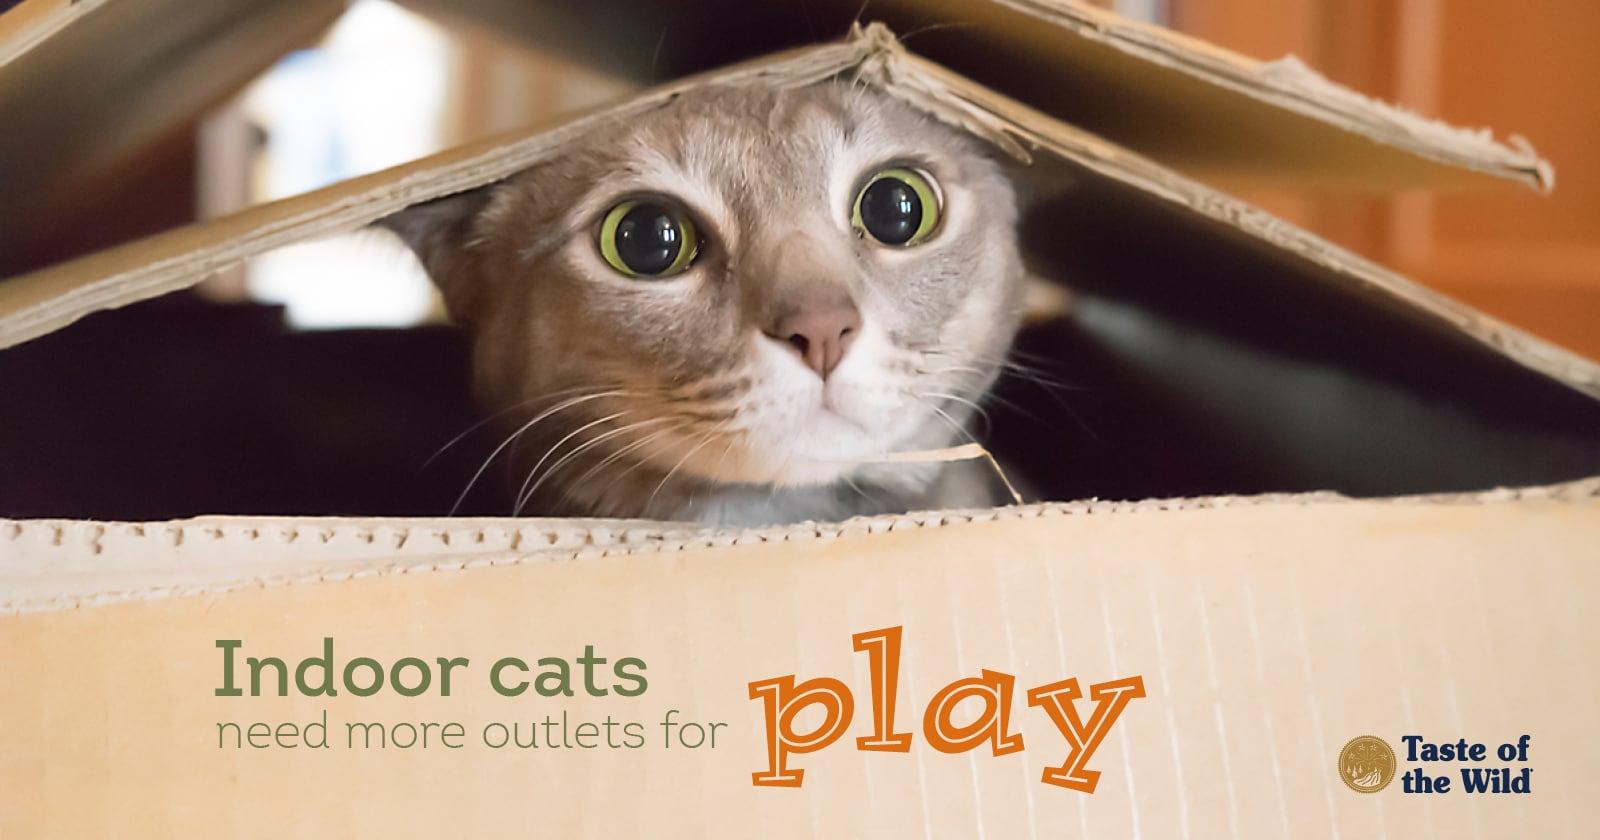 grey cat peeking head out of a box